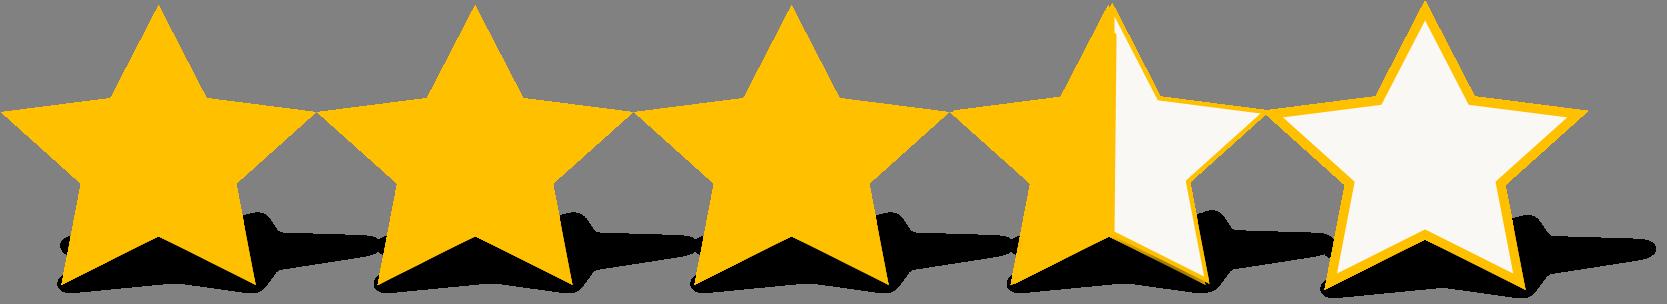 Rating 3.5 Stars